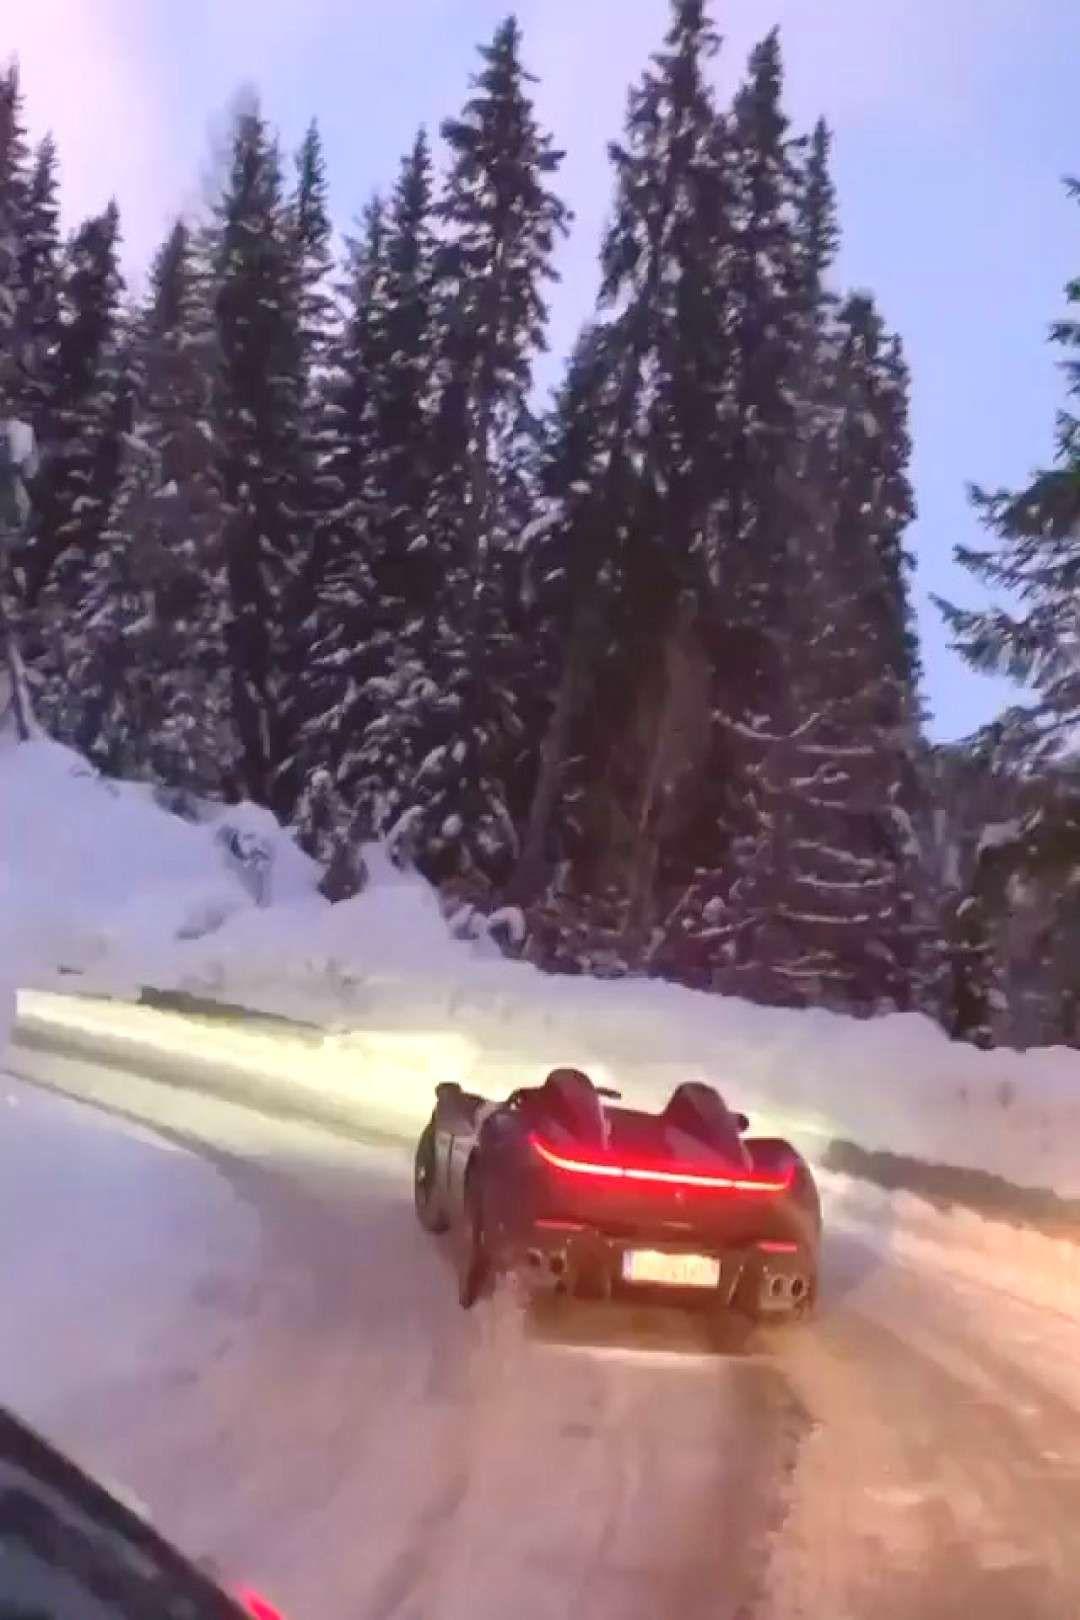 Ferrarif40 Drifting Driftcar Ferrari Modeli Hangi Bilen Drift Varm Nin Ferrari Nin Hangi Modeli Bilen Va In 2020 Ferrari F40 Dashing Through The Snow Ferrari